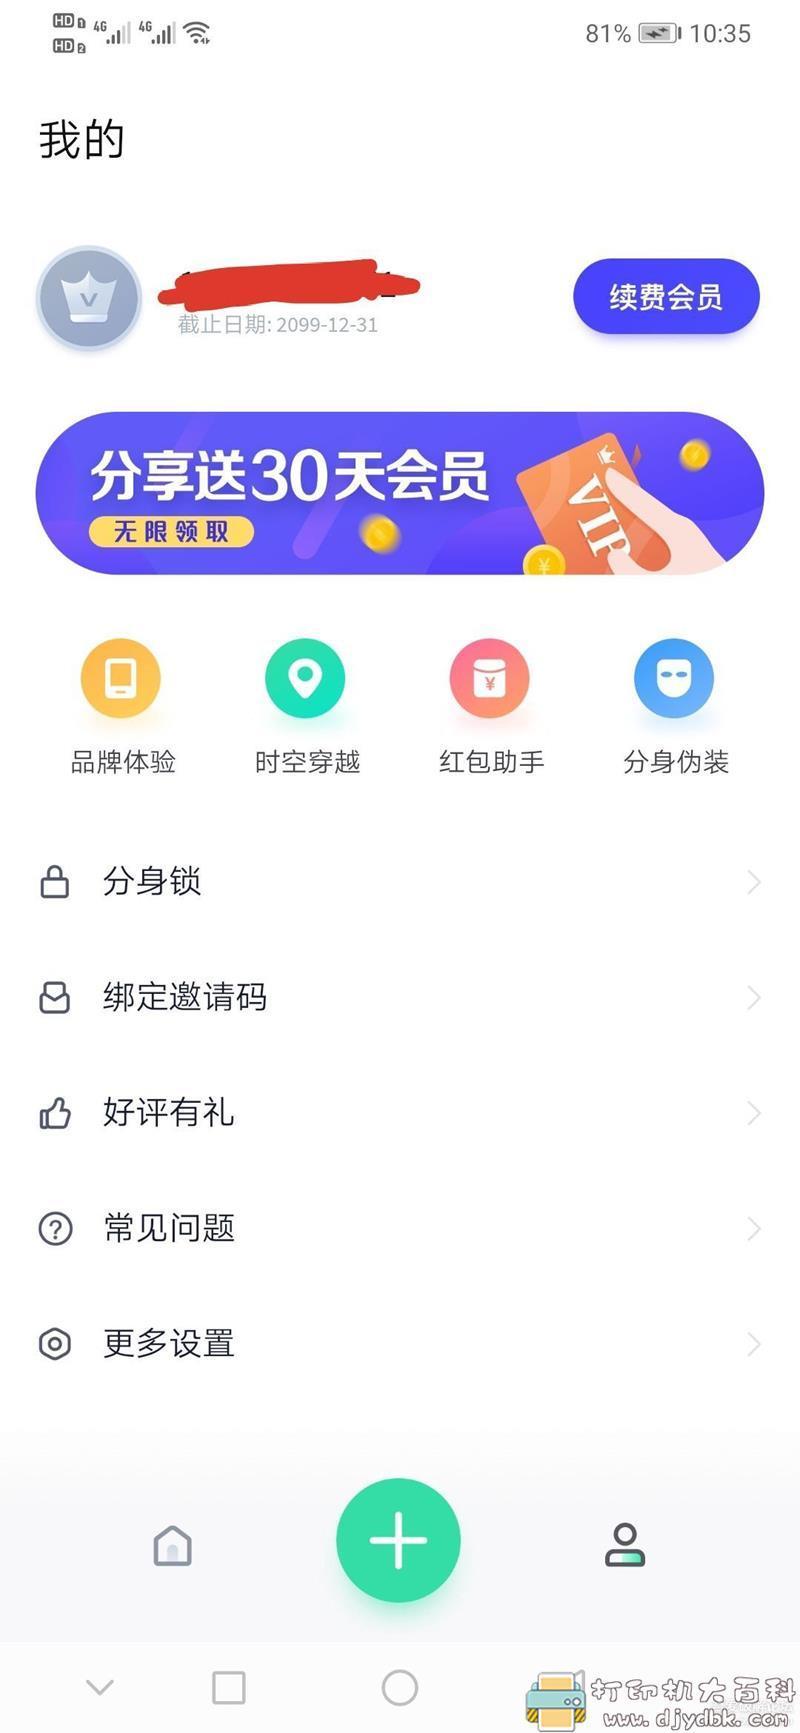 [Android]安卓免root多开软件,支持华为手机 配图 No.1